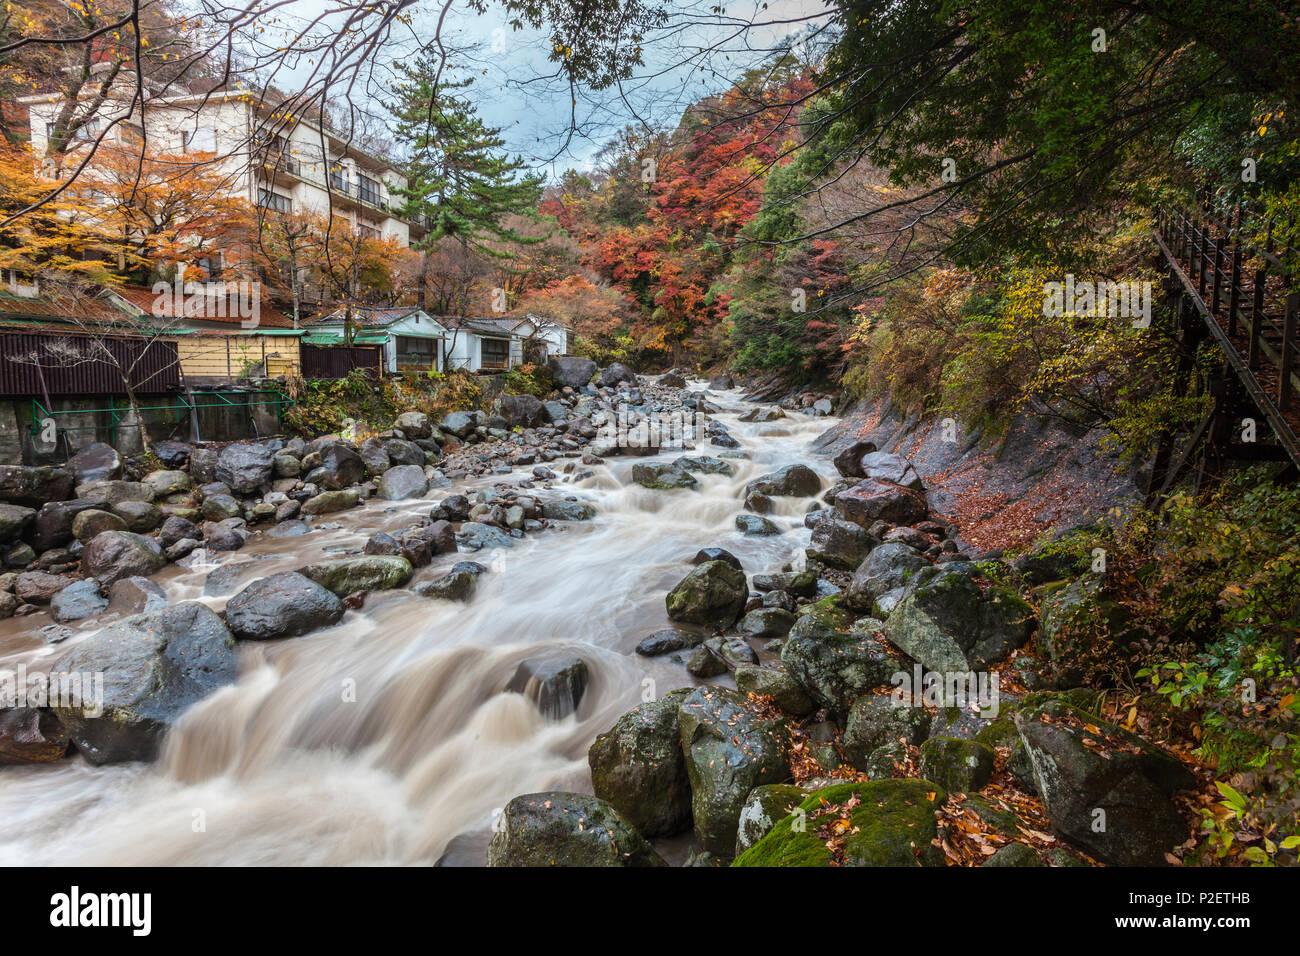 Wild mountain stream in autumn at Miyanoshita, Kanagawa Prefecture, Japan - Stock Image